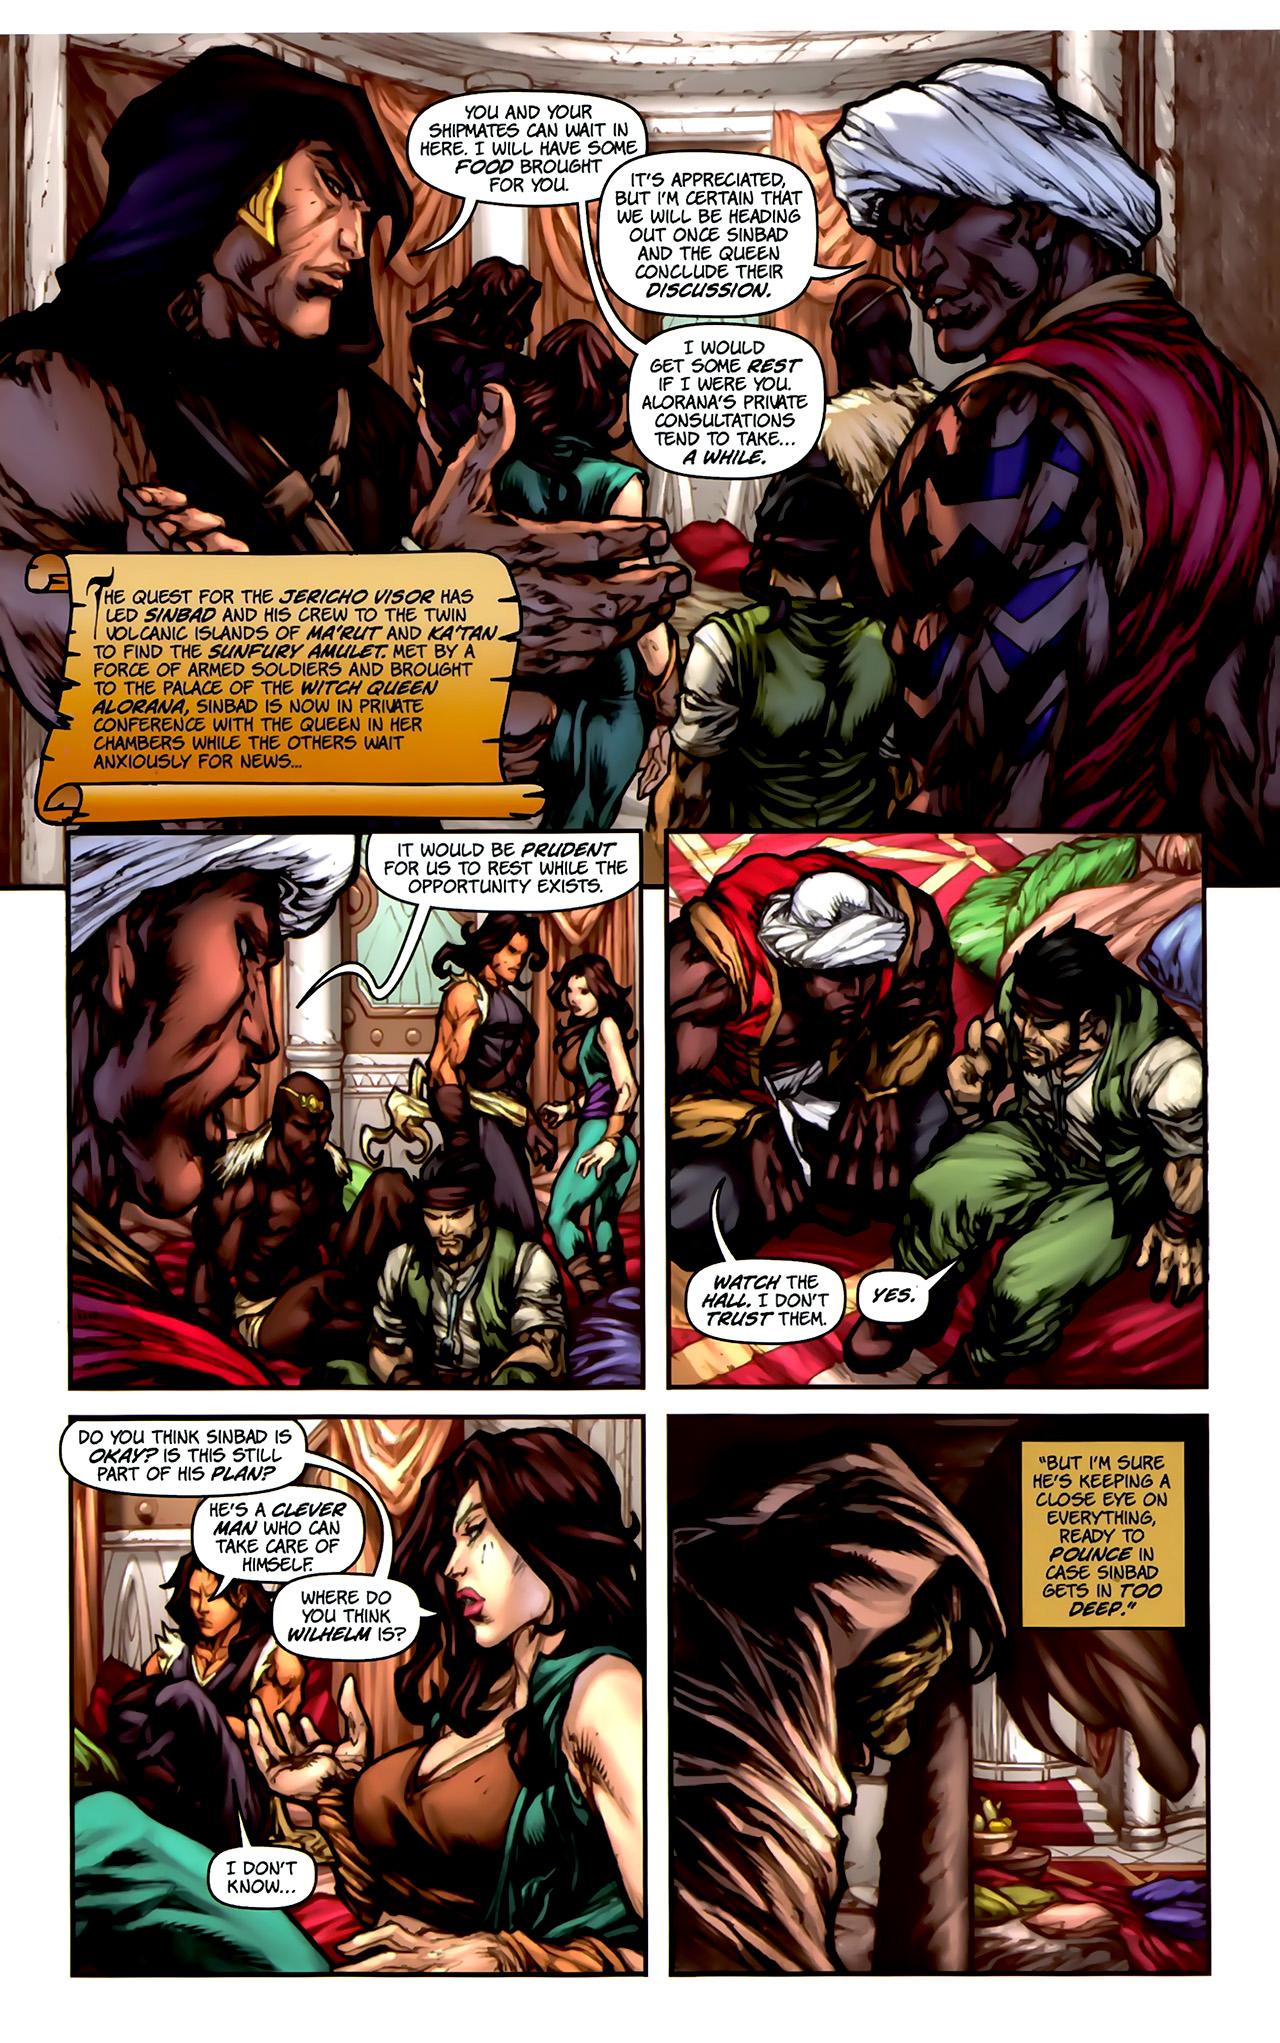 Read online 1001 Arabian Nights: The Adventures of Sinbad comic -  Issue #2 - 7